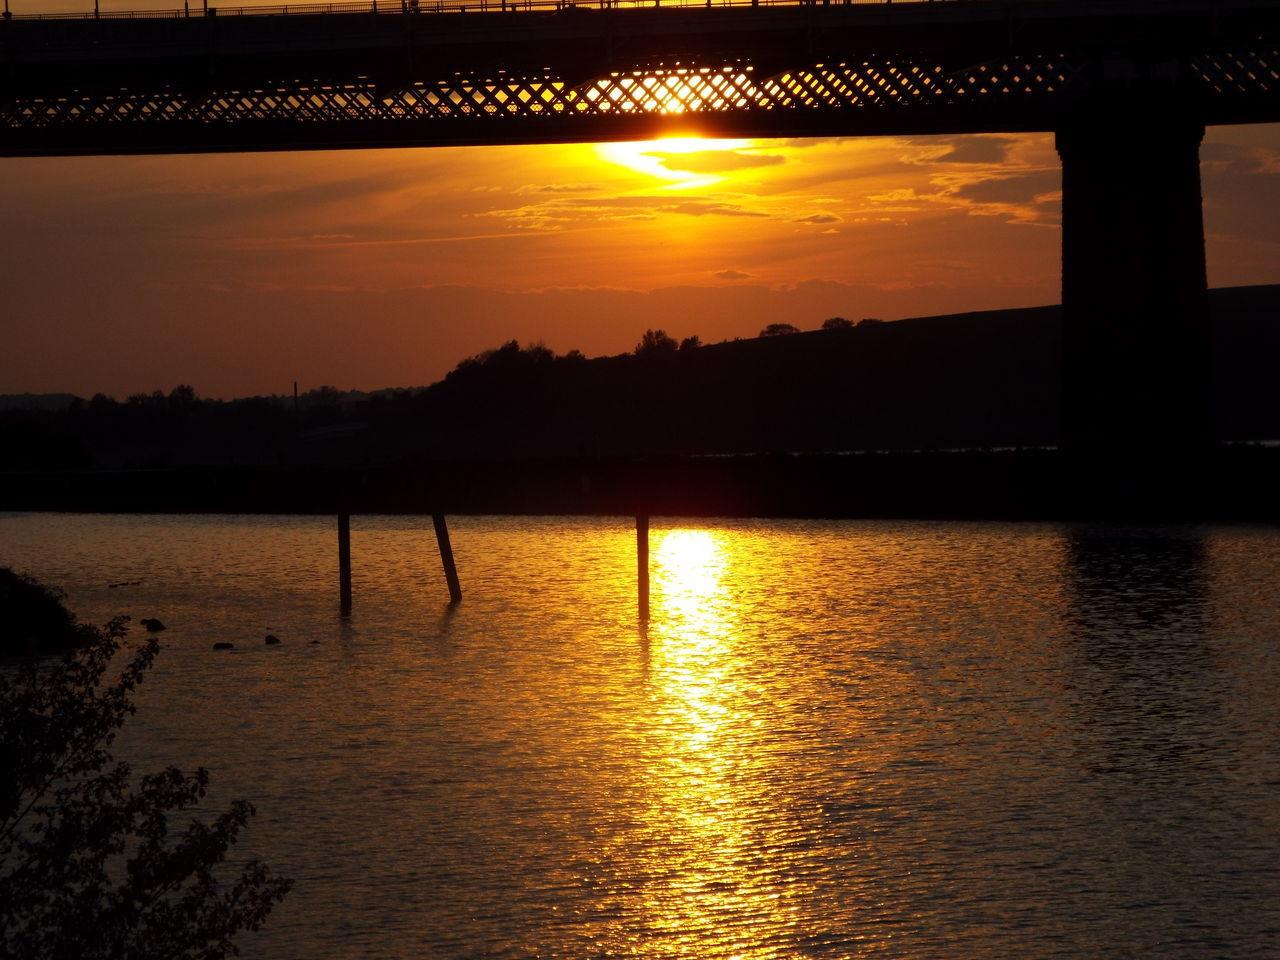 Sunset Runcorn Bridge Bridge Runcorn Railway Bridge Two Bridges Architecture Steel Structure  River Mersey River Water Sky - Clouds Silhouette Silhouette Of A Bridge Red Sky Red Sky At Night... Red Sky At Sunset 43 Golden Moments